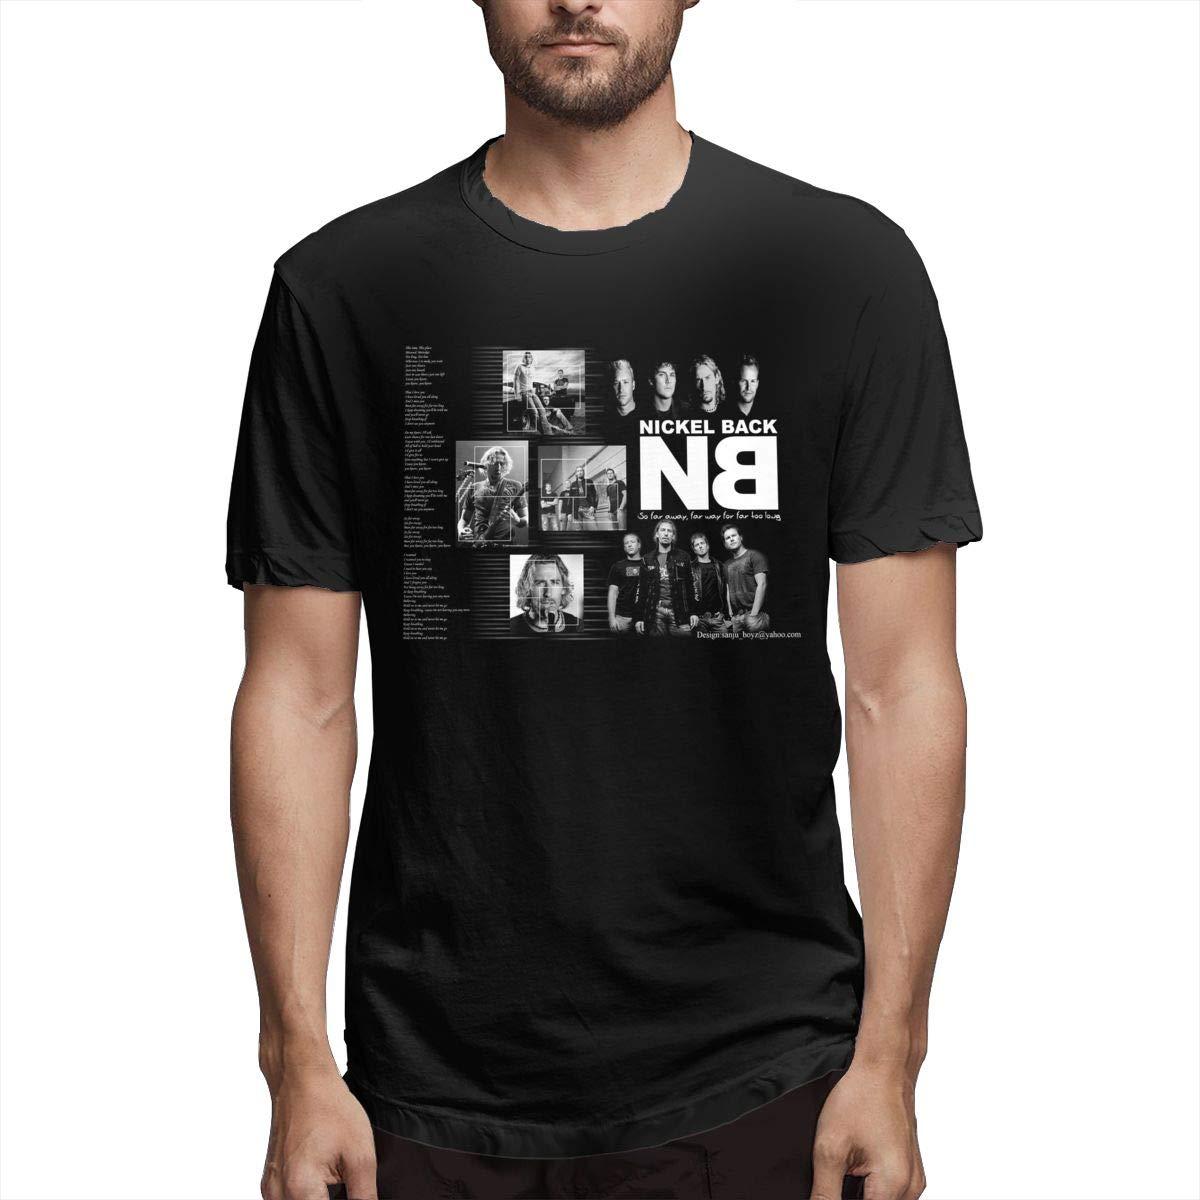 S Nickelback Funny Short Sleeve T Shirt